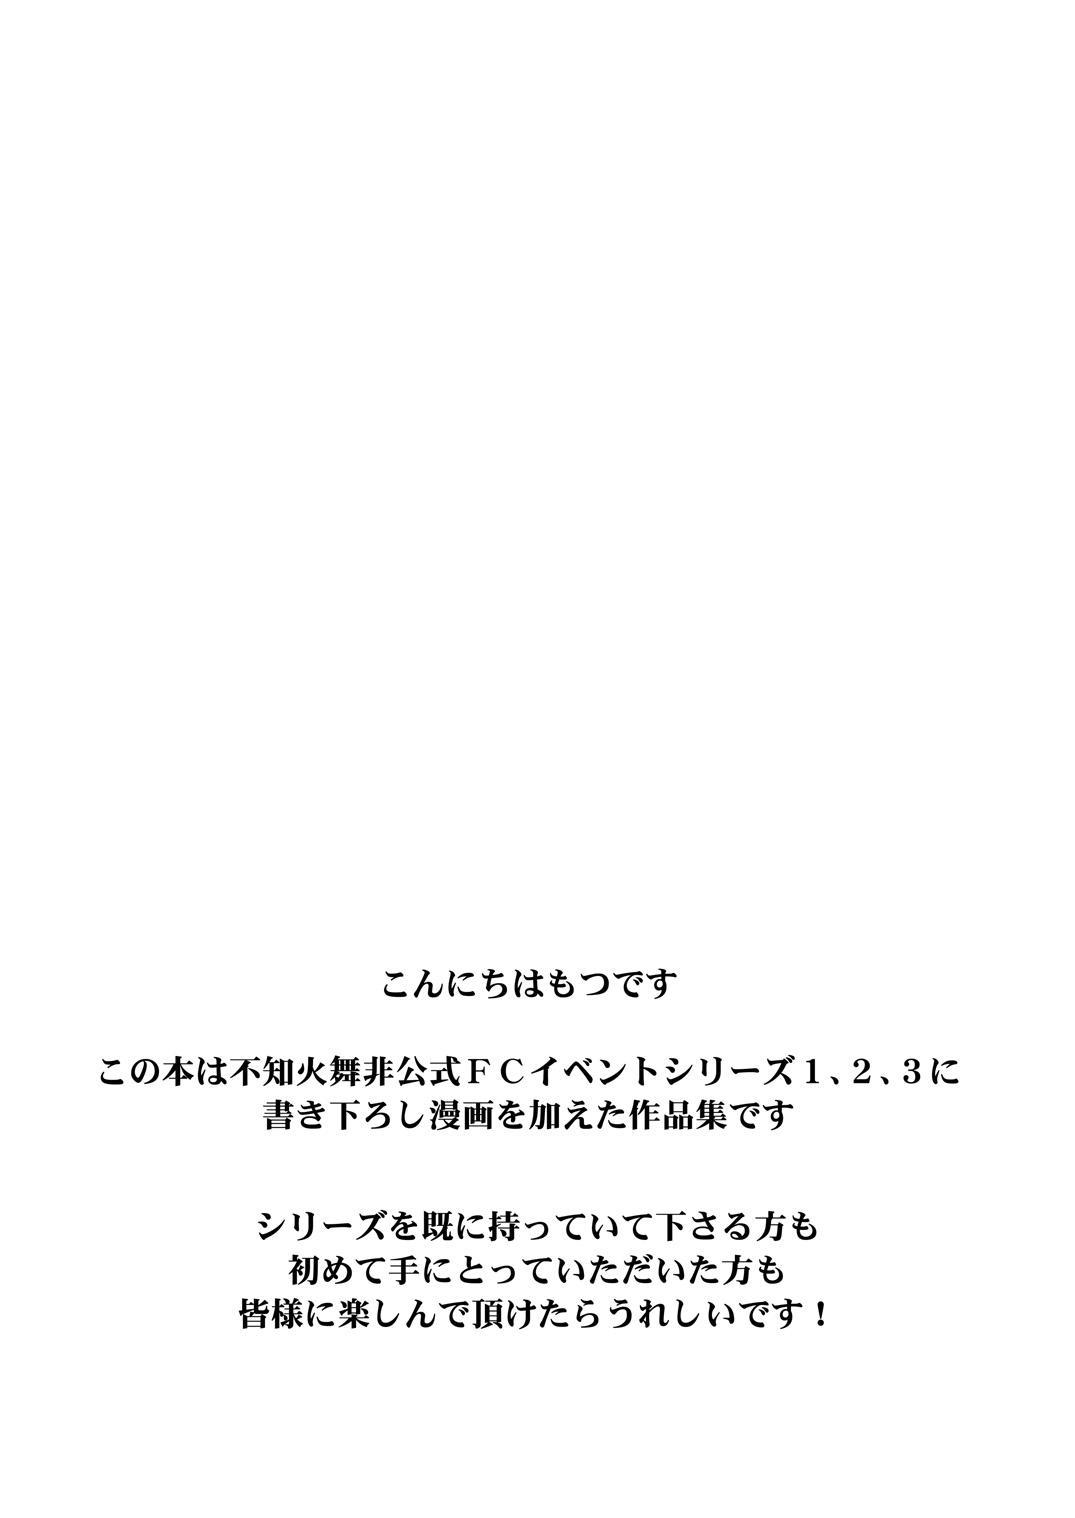 Shiranui Mai Hikoushiki FC Event 123+ 2